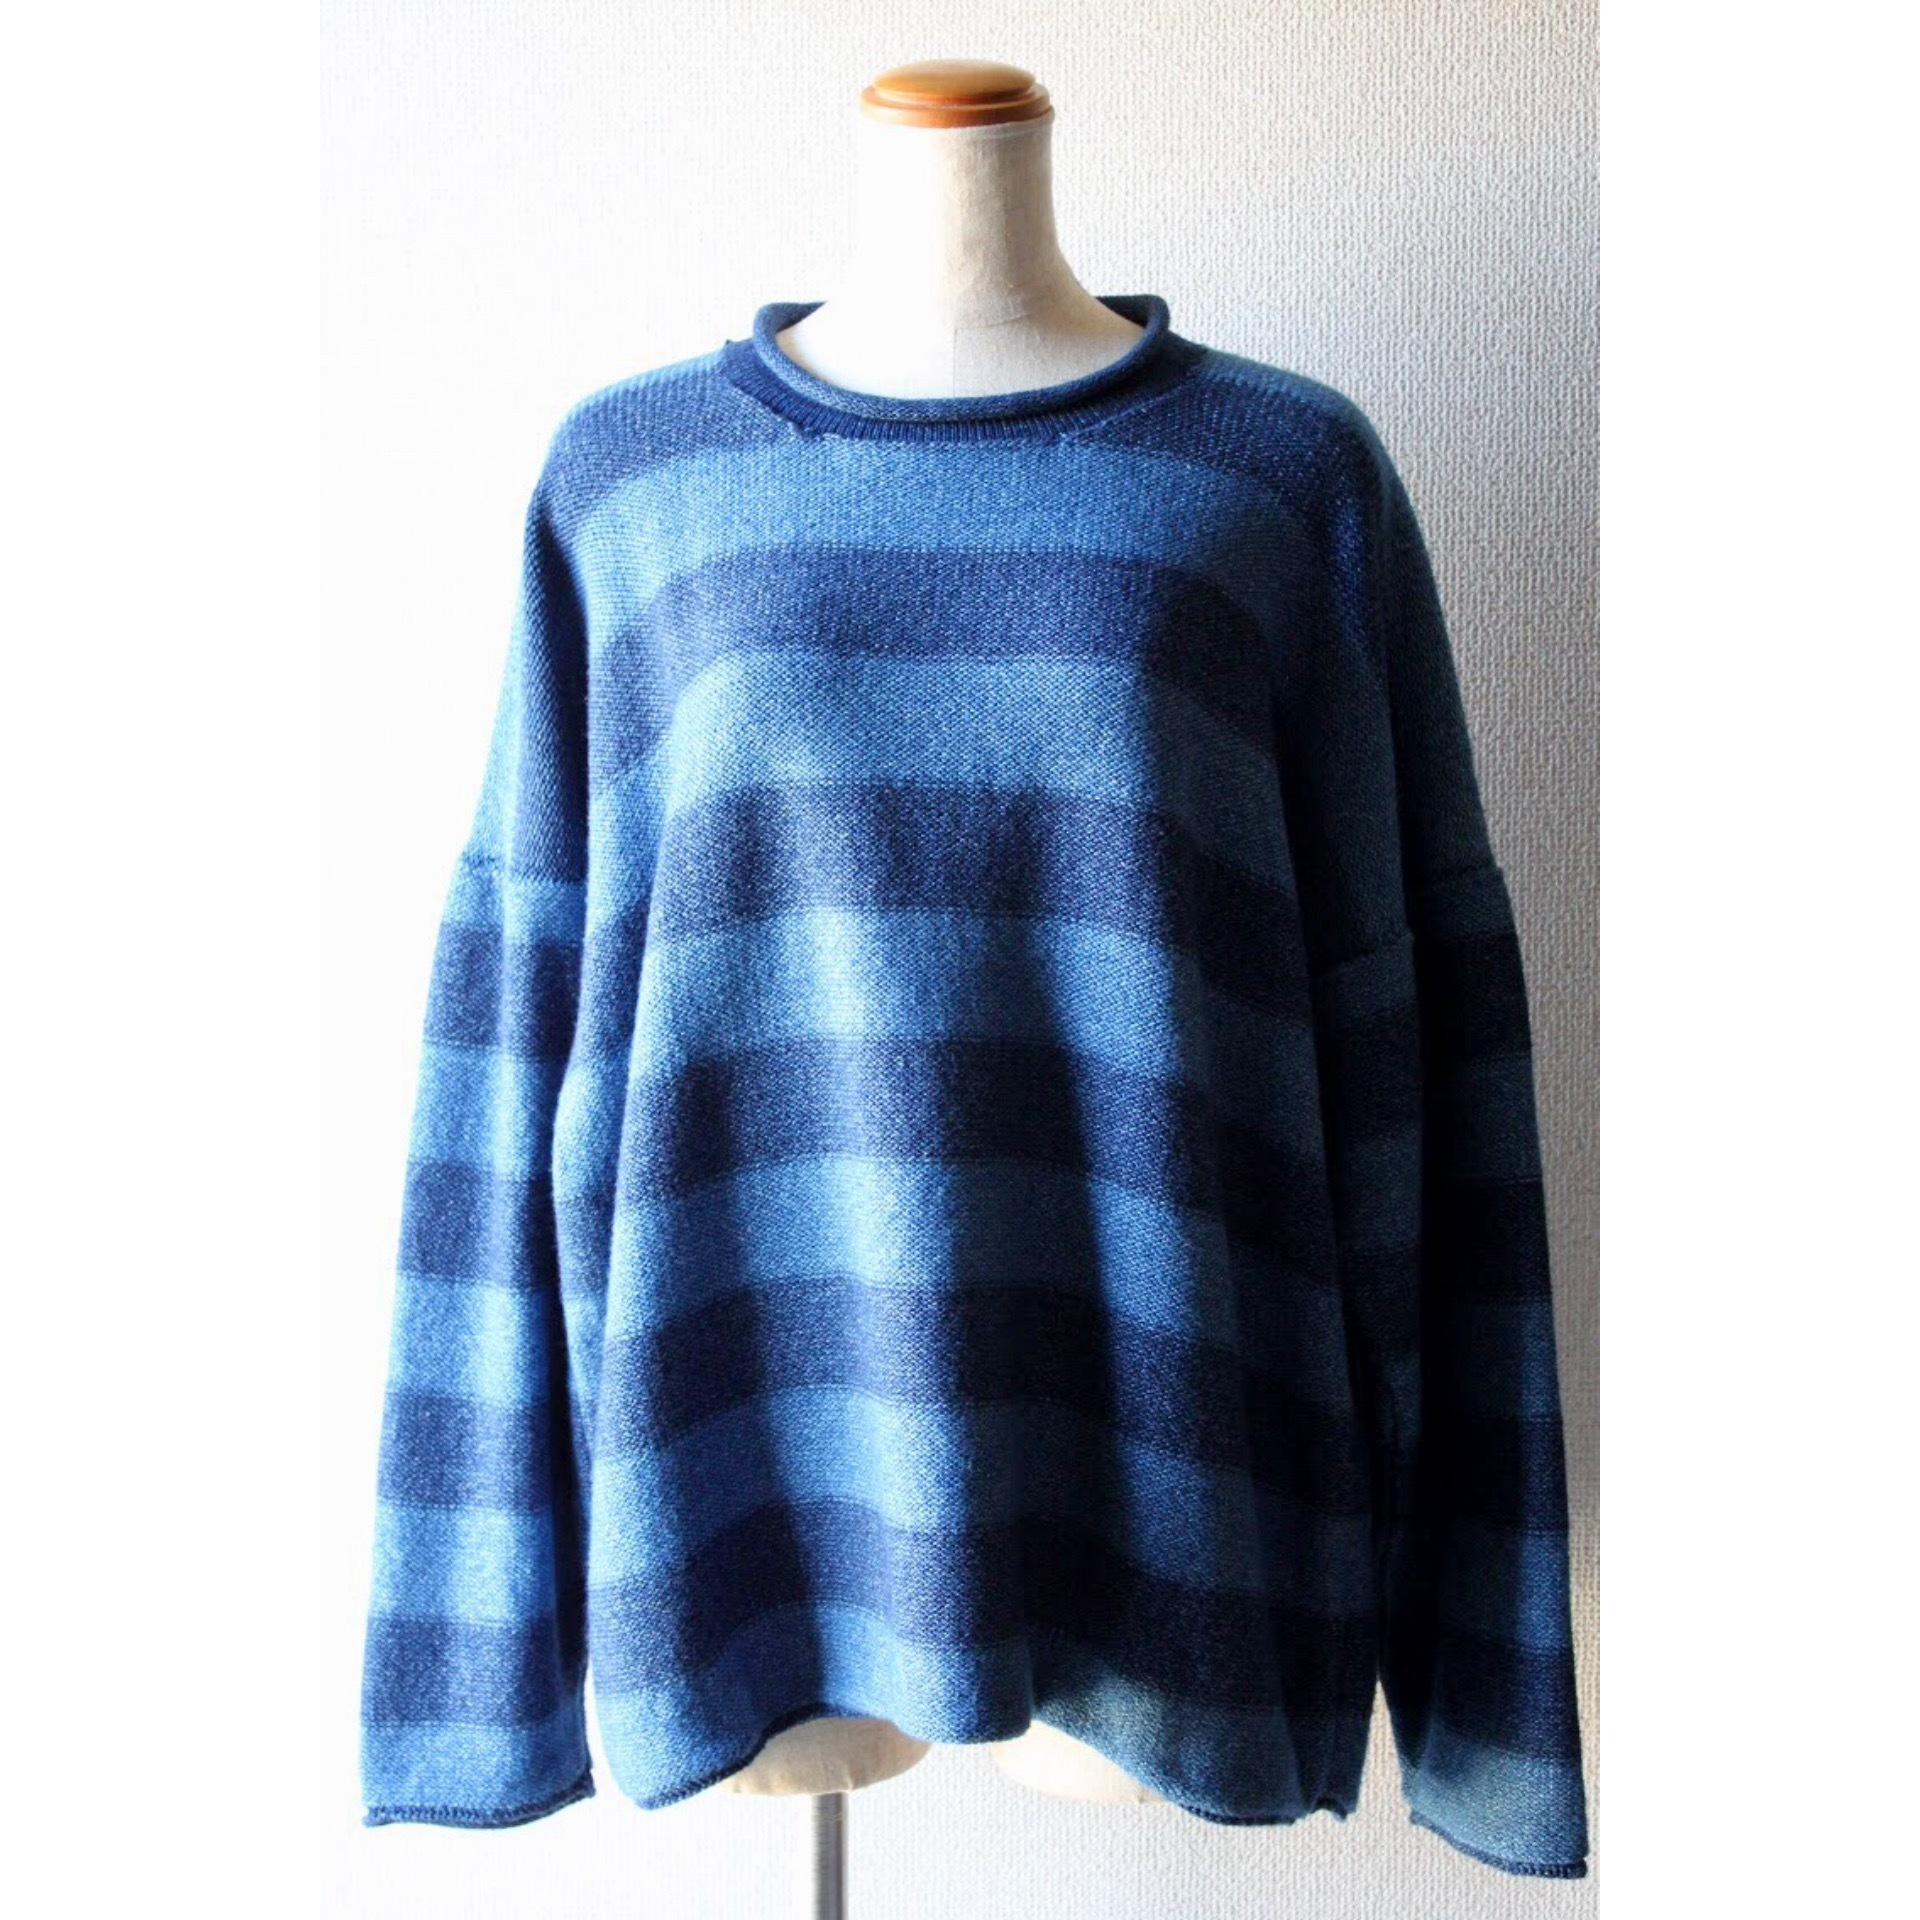 Vintage indigo border sweater